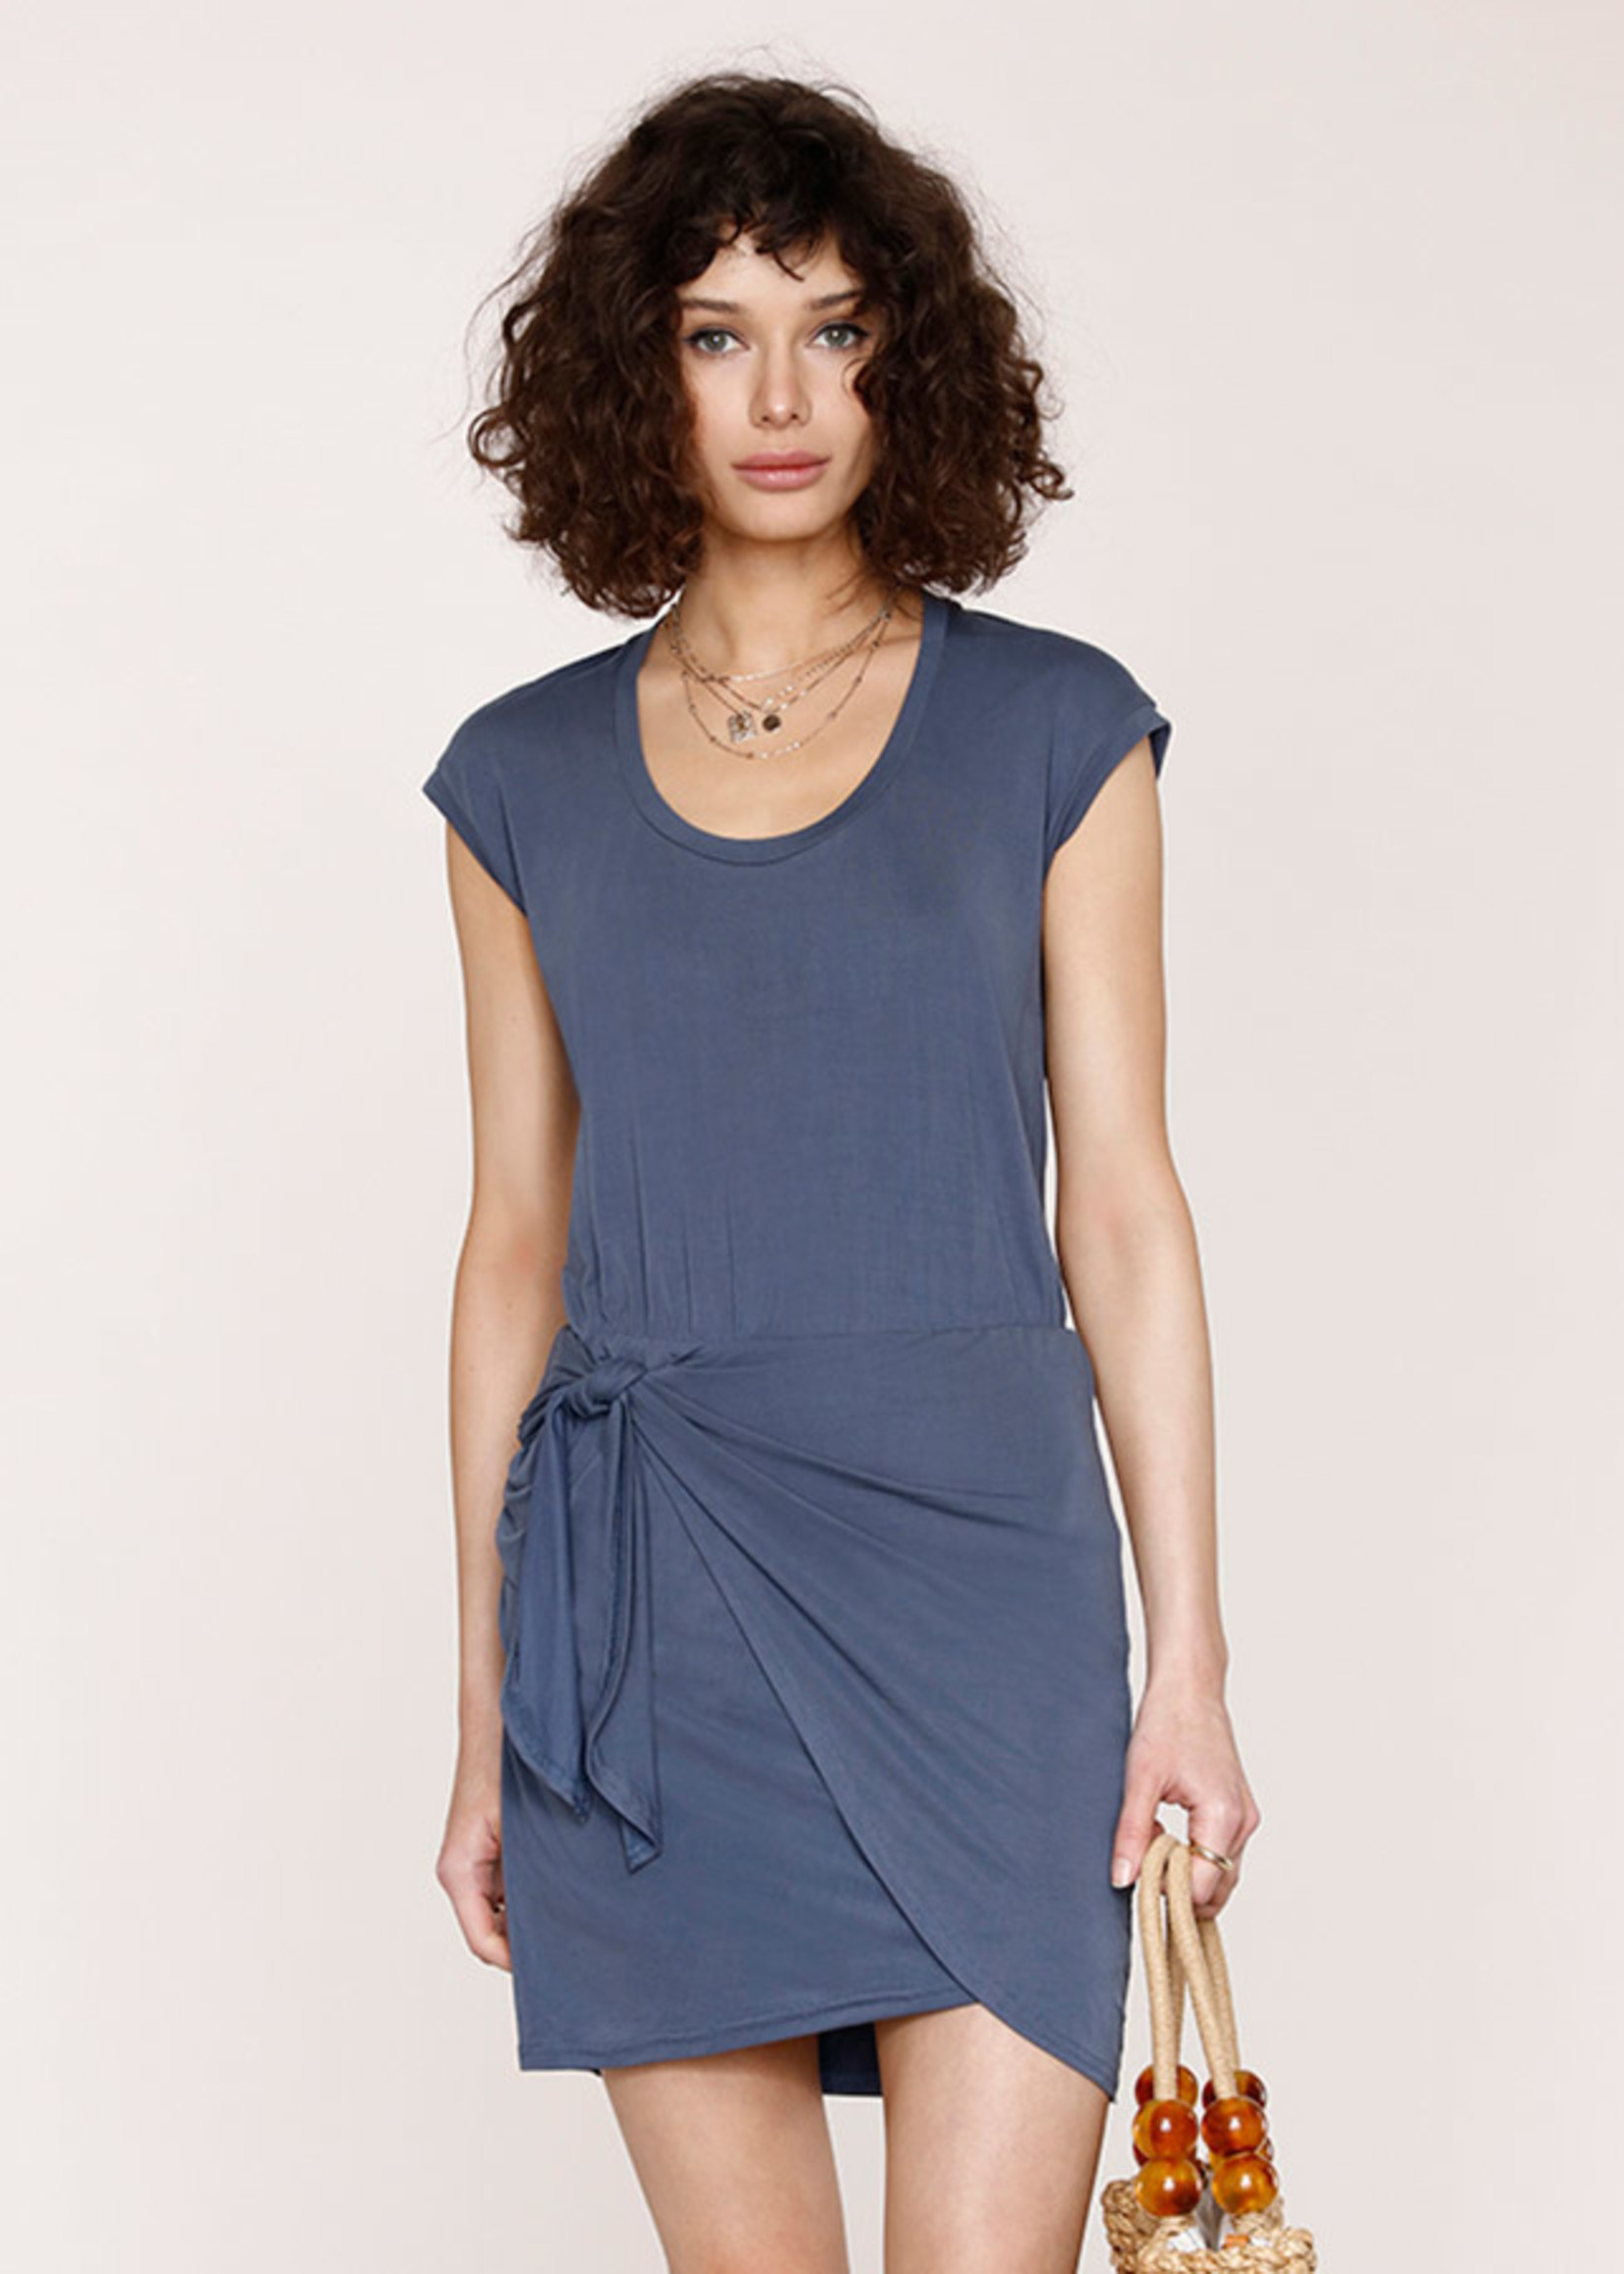 Elitaire Boutique Martin Marine Dress